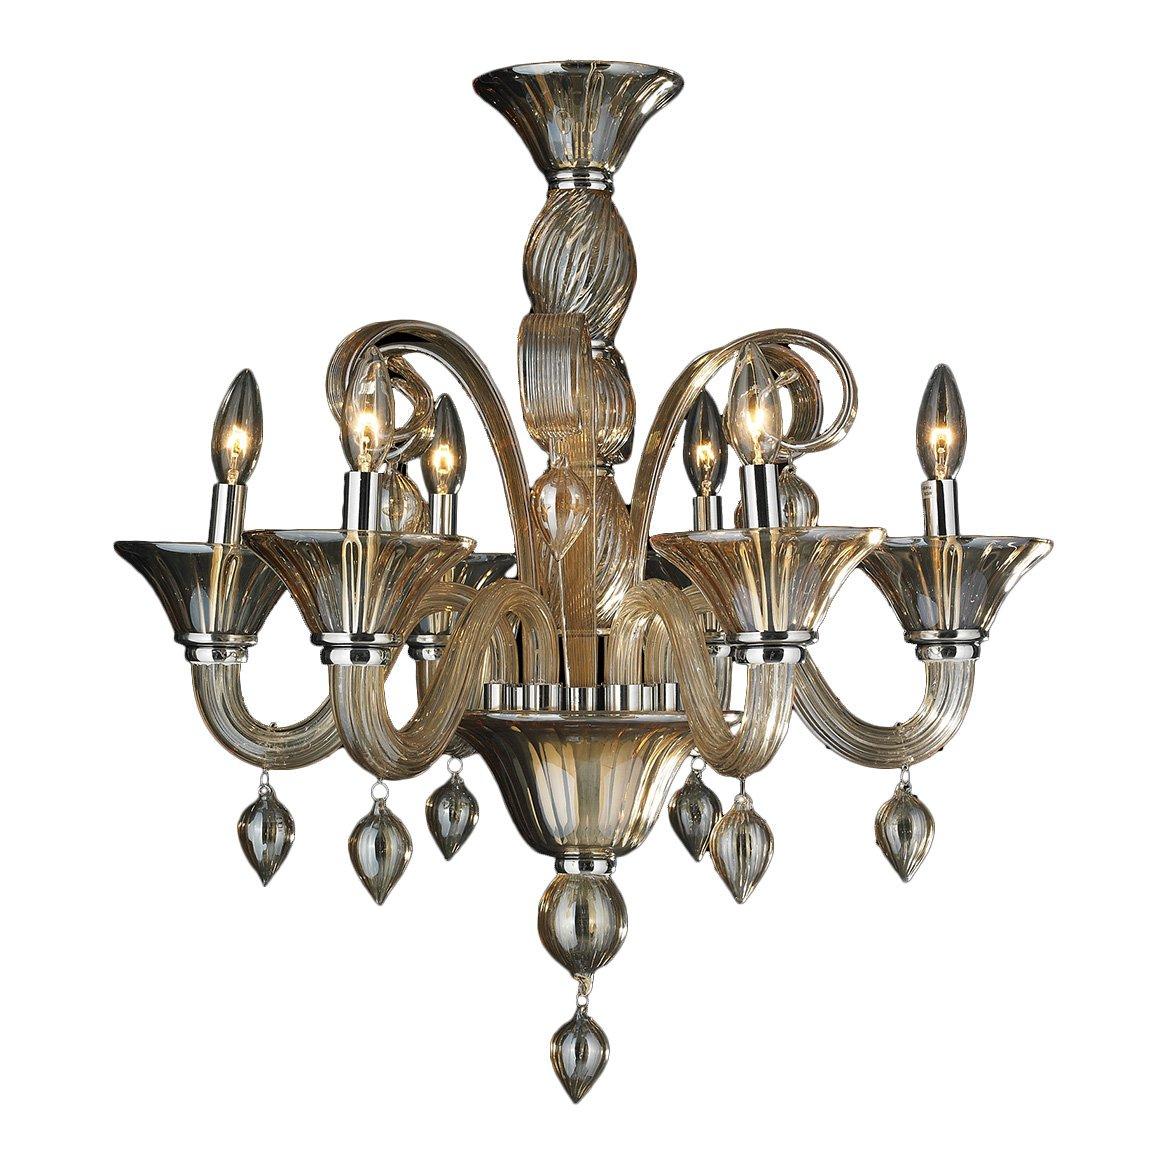 Worldwide Lighting Murano Collection 6 Light Blown Glass in Amber Finish Venetian Style Chandelier 23'' D x 27'' H Medium